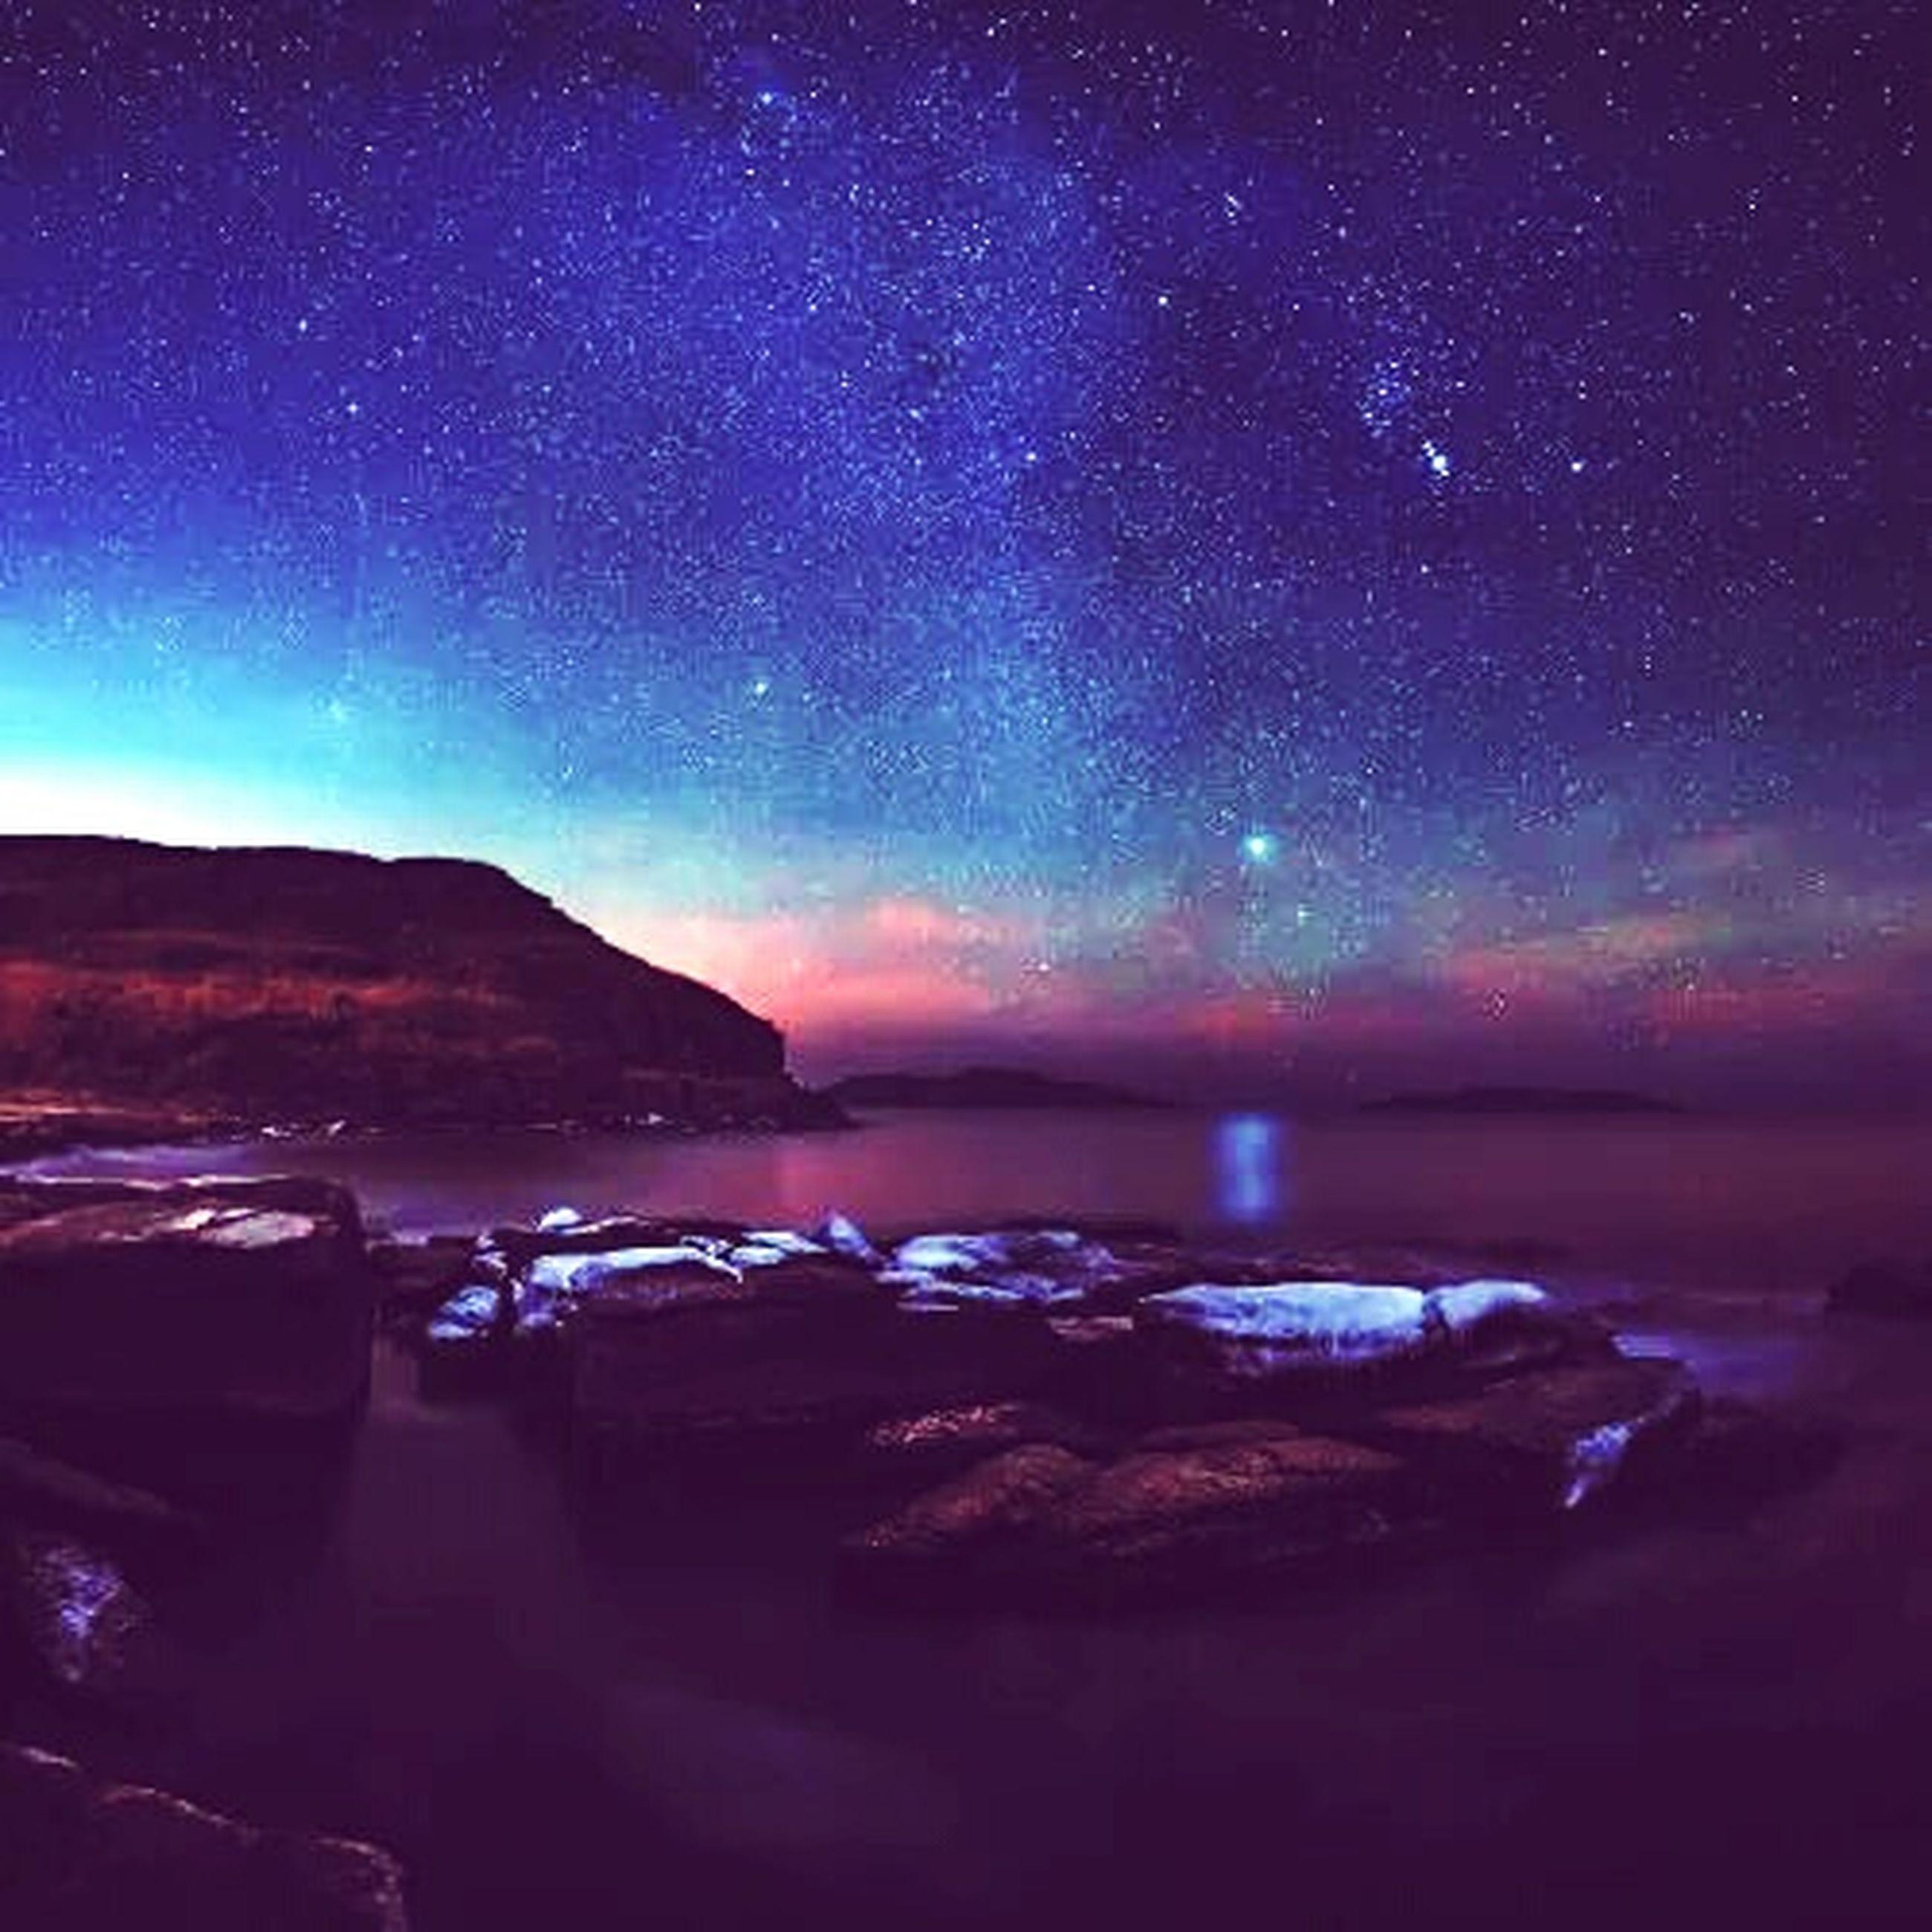 night, star - space, sky, scenics, star field, tranquil scene, astronomy, beauty in nature, tranquility, galaxy, nature, star, mountain, space, dark, idyllic, majestic, milky way, landscape, illuminated